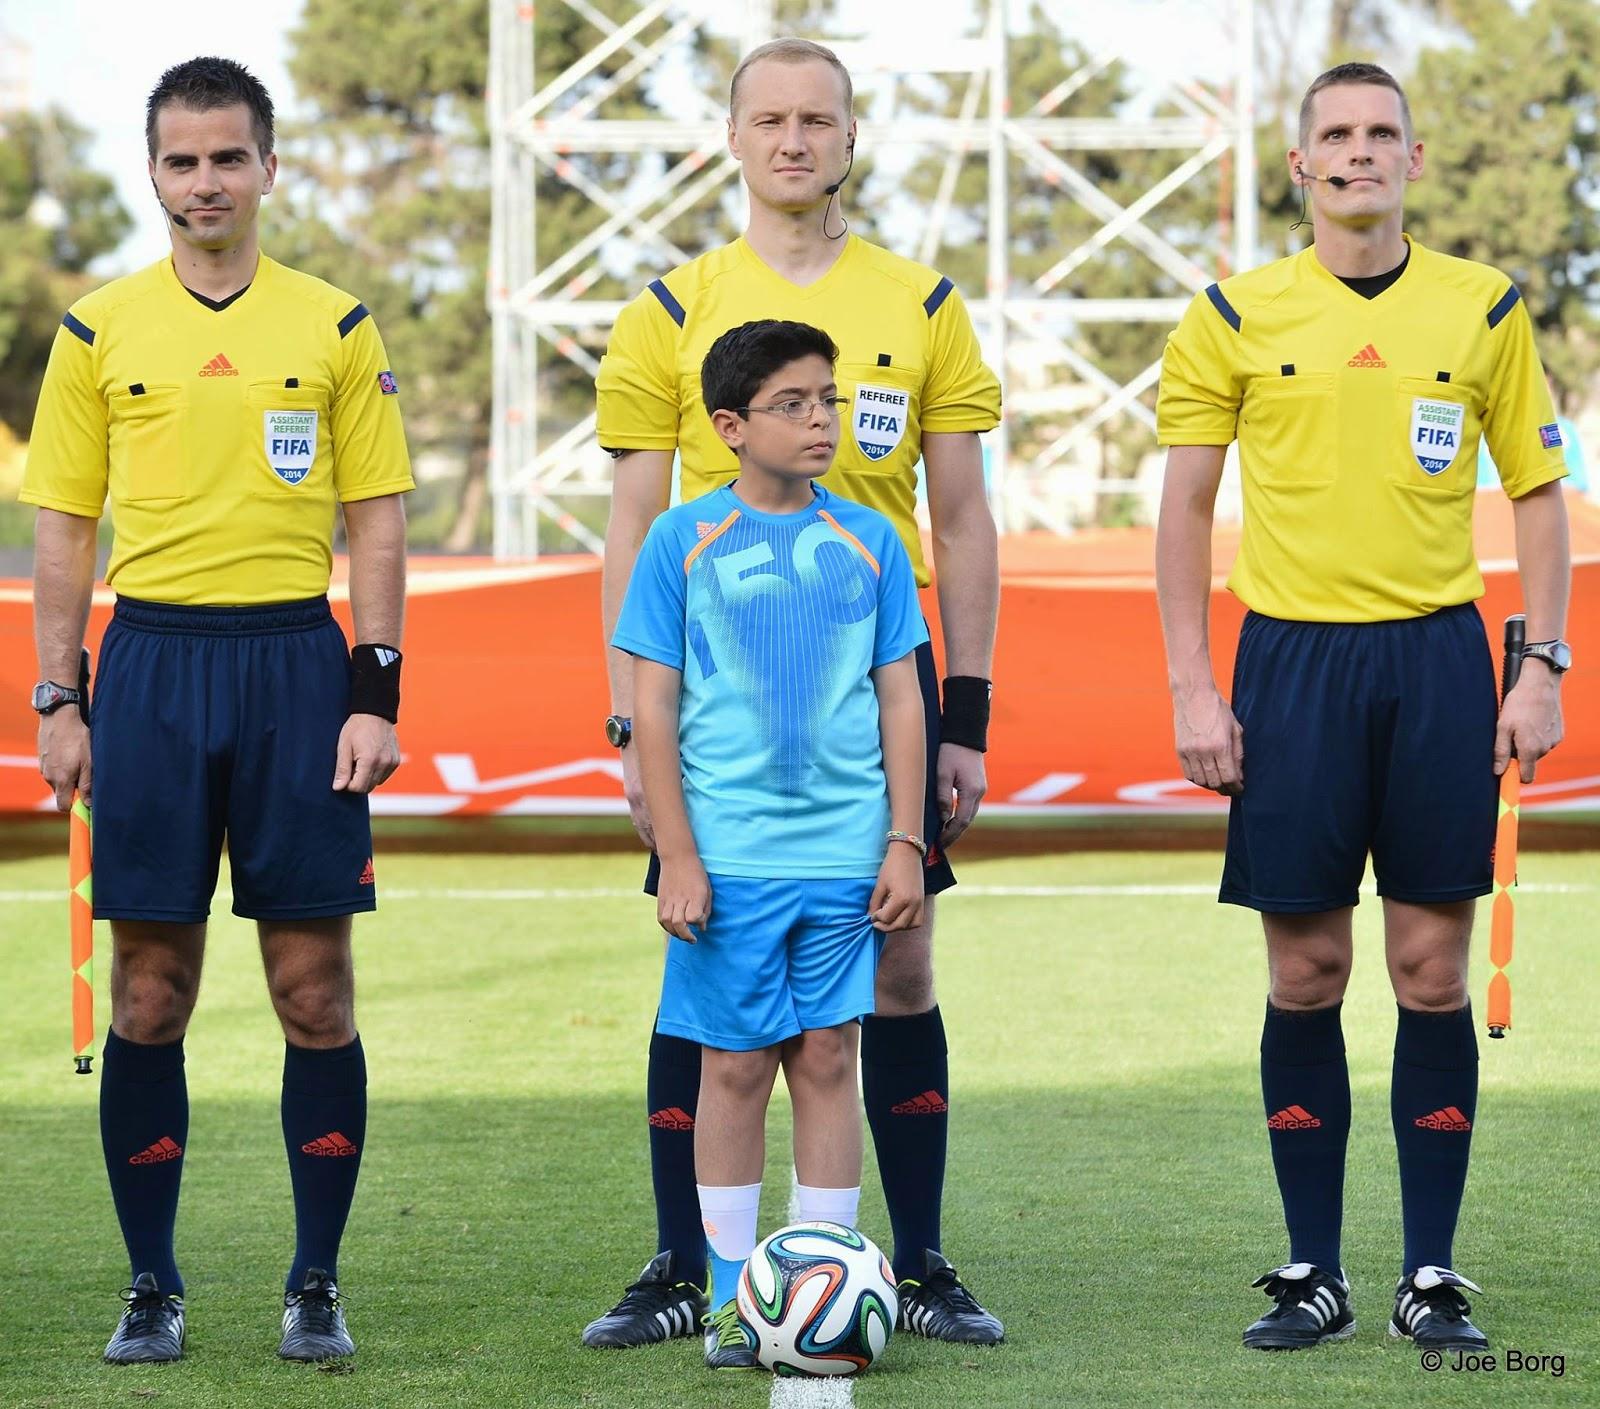 U17 Stock Photos U17 Stock Images: FIFA Referees News: 2014 UEFA U17 Championship